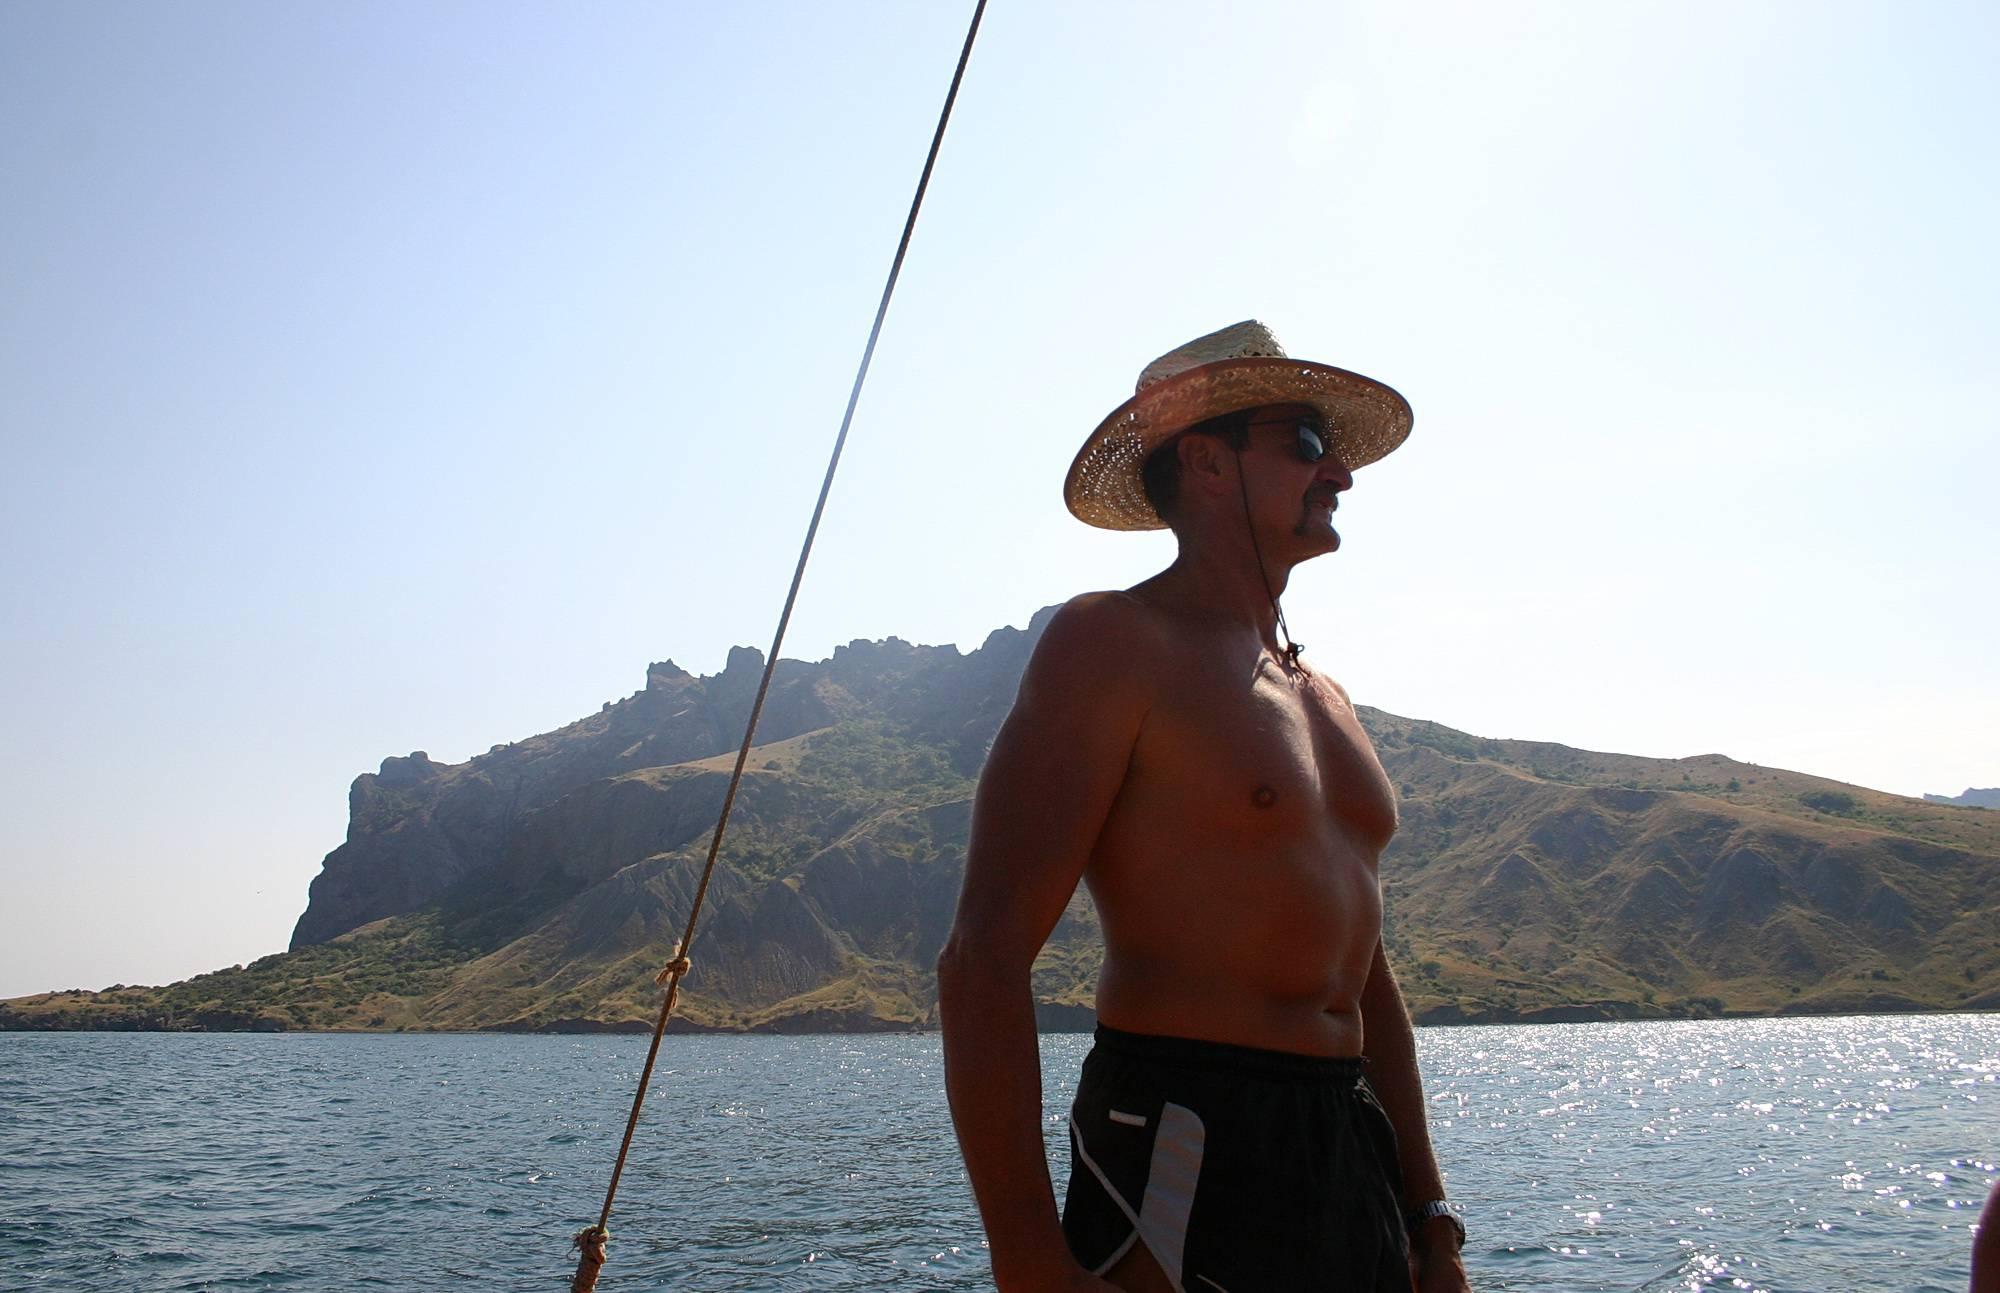 Ukrainian Sea Boating Two - 2